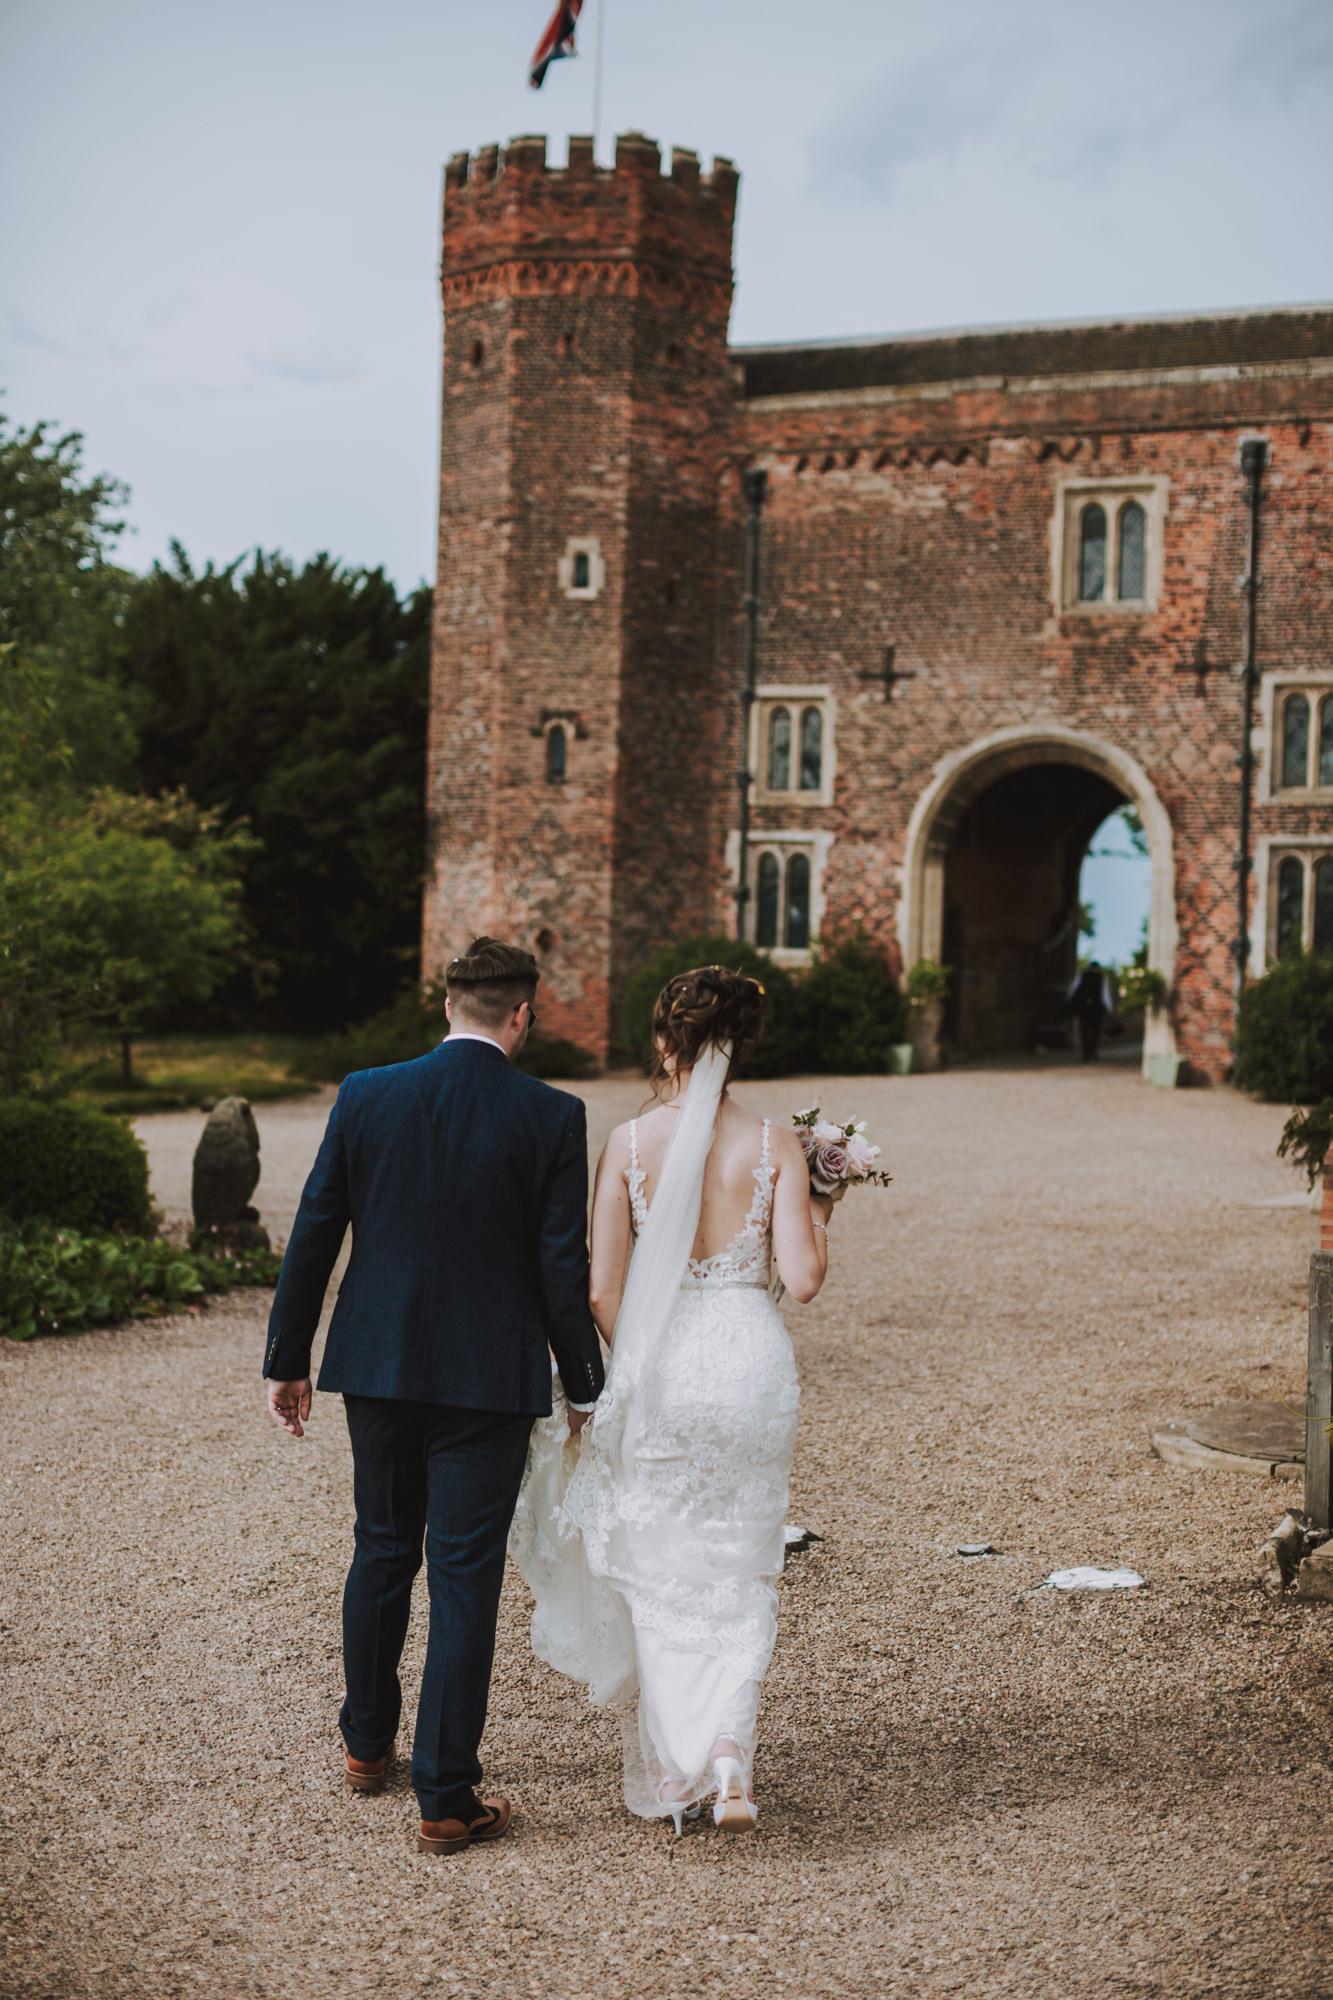 hodsock priory wedding photographers blog68.jpg